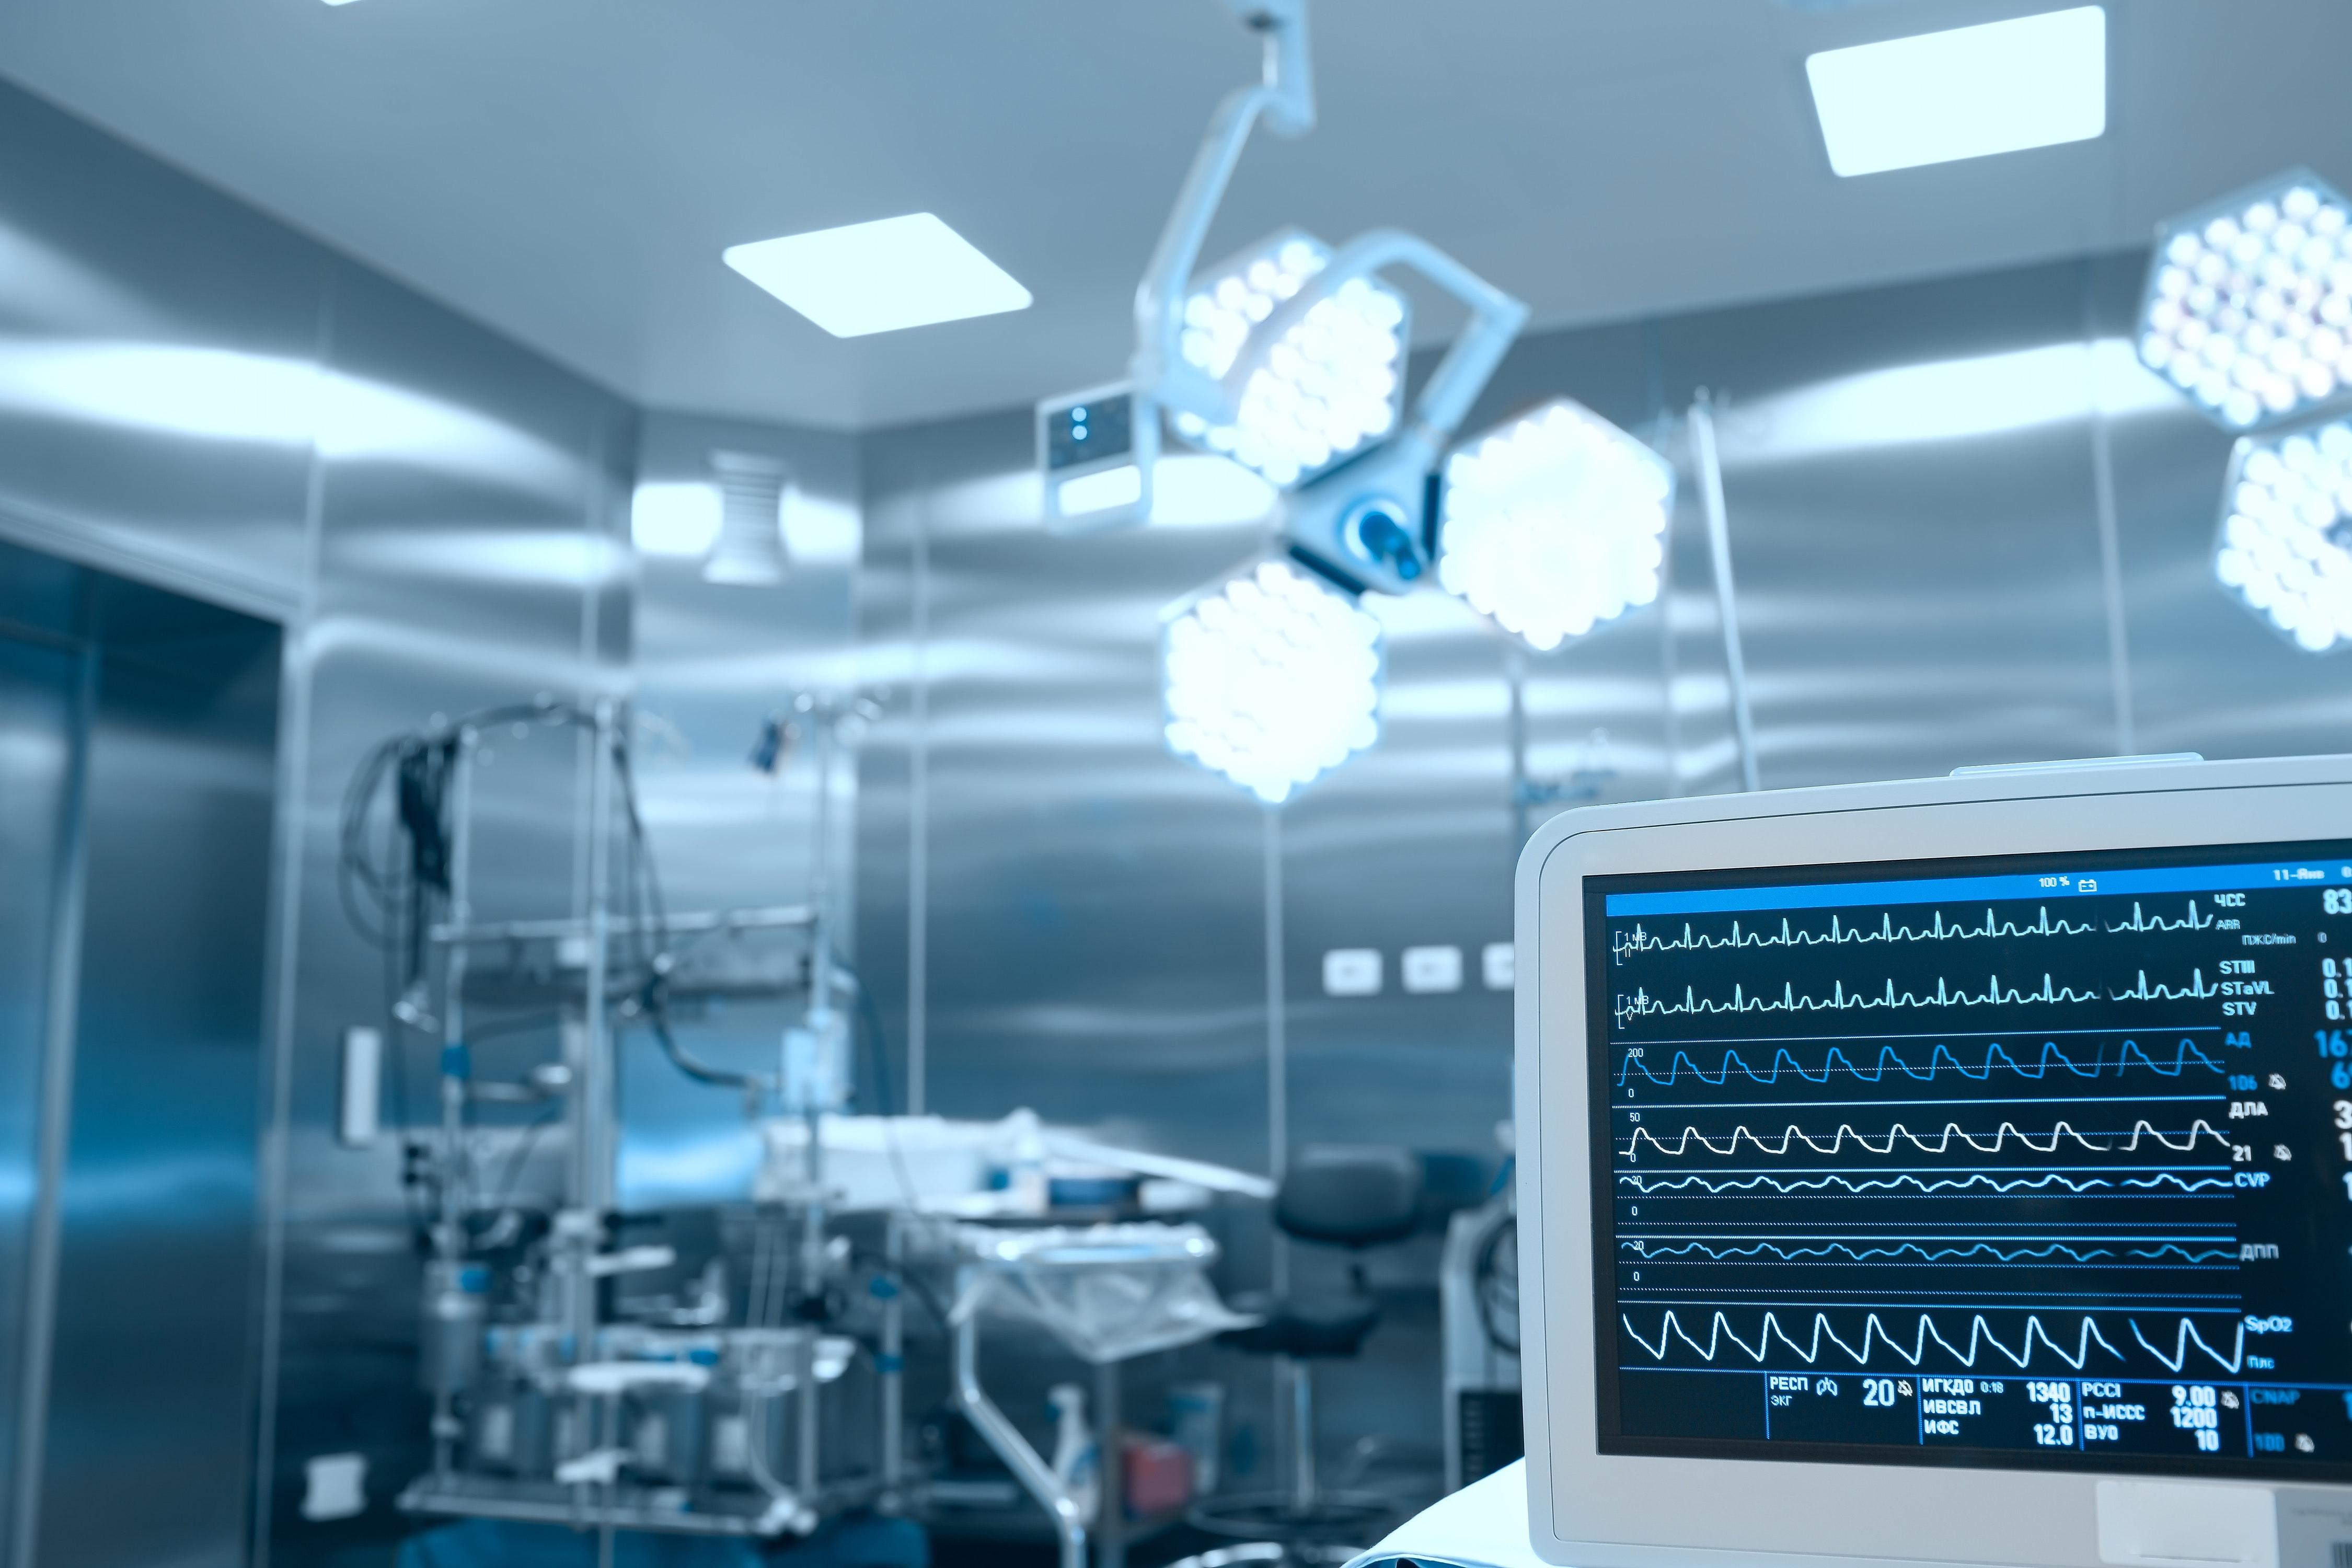 Intensivmedizin - Symbolbild Medizinphysik Berufsaussichten